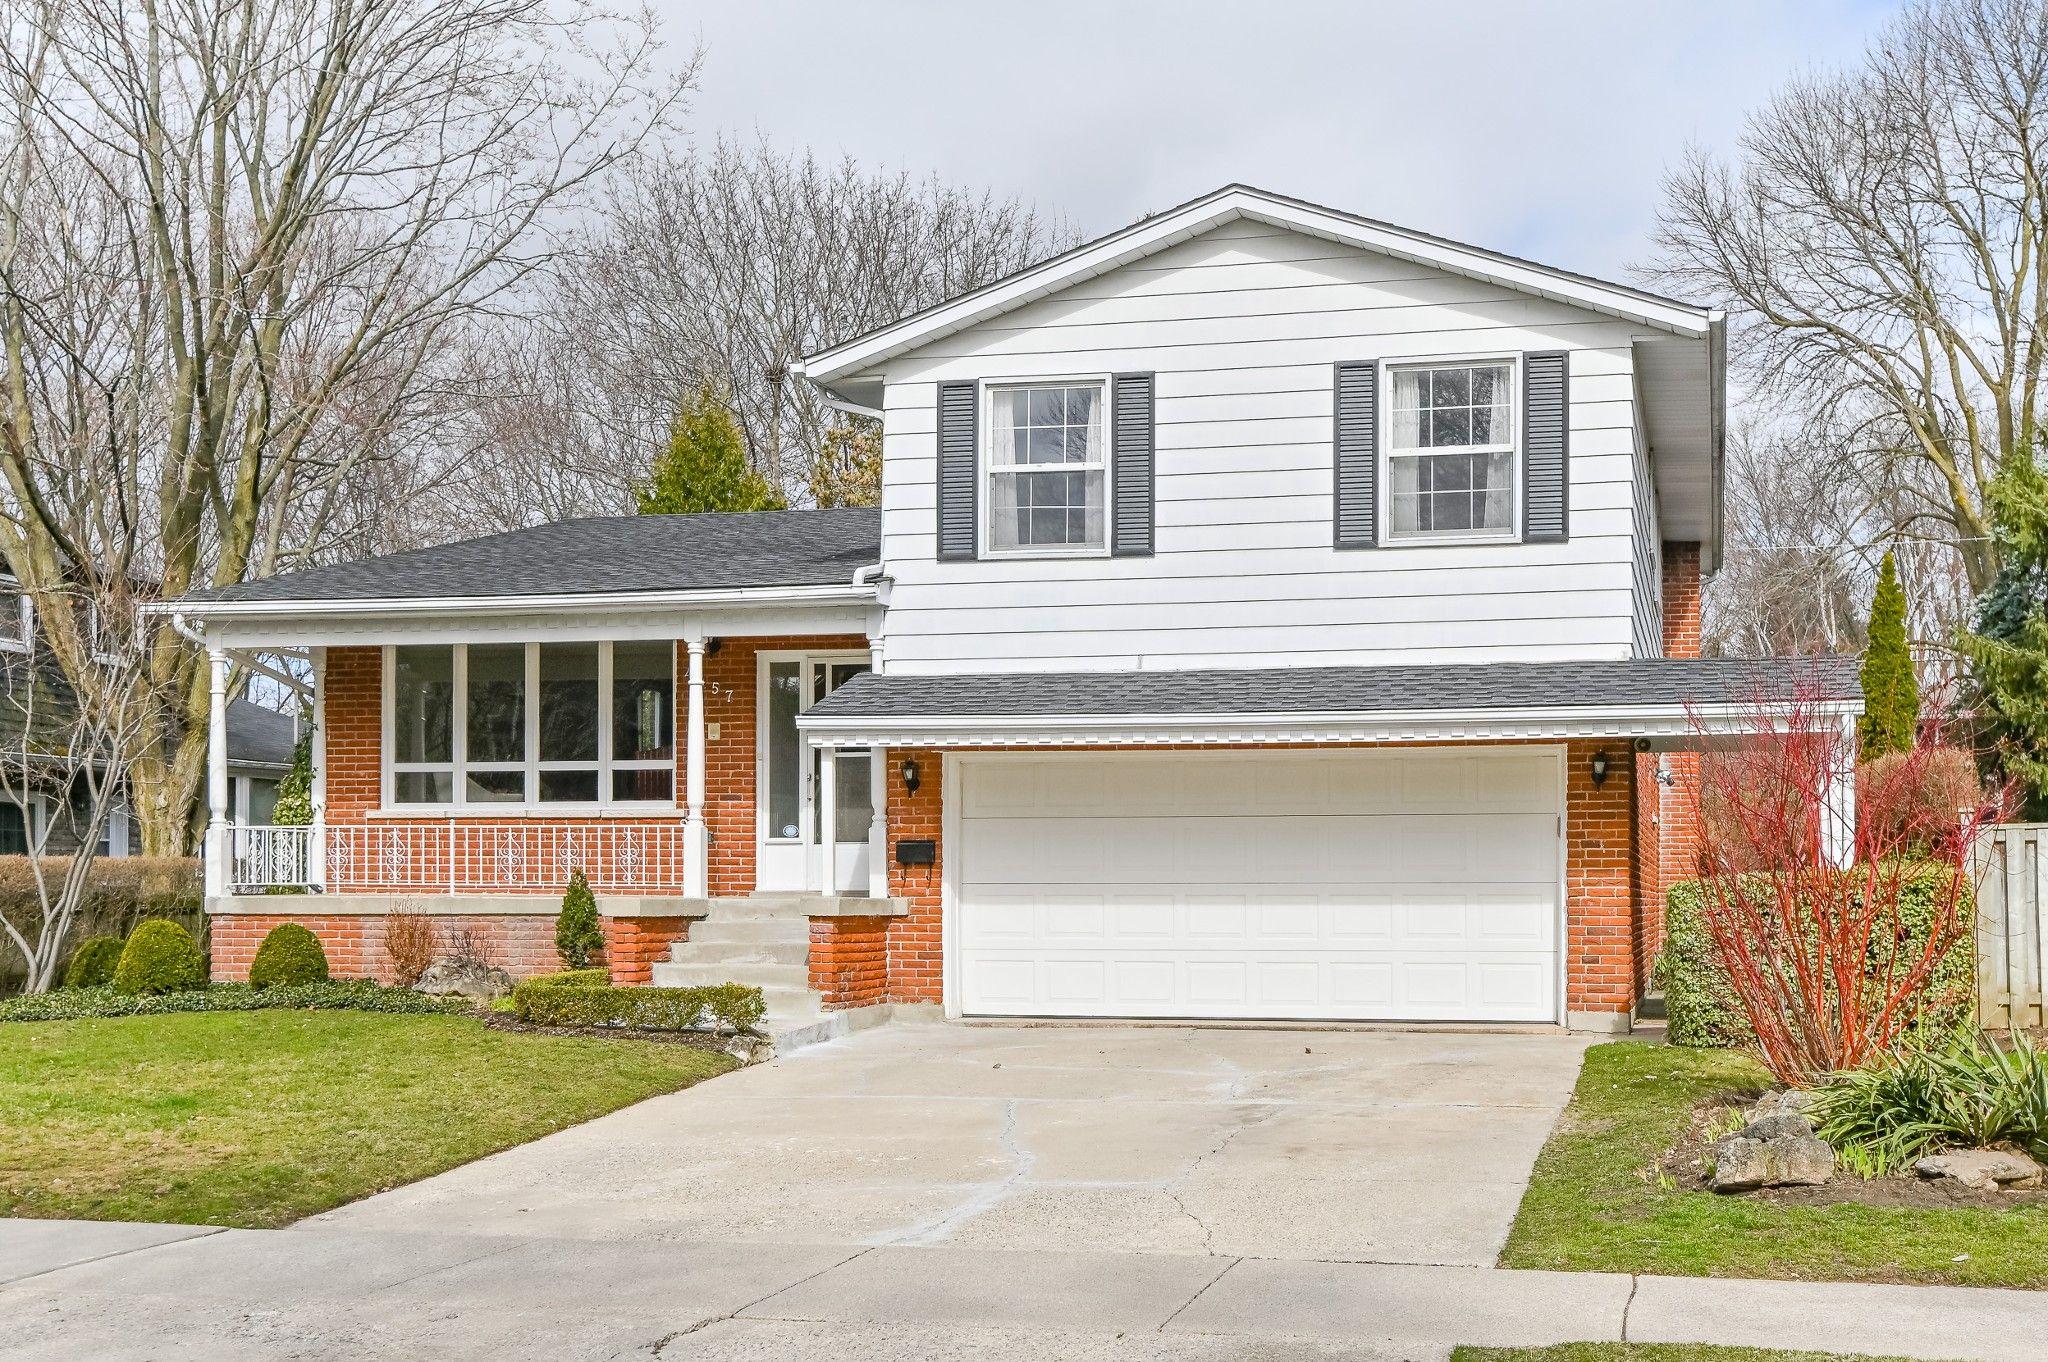 Main Photo: 4457 Hawthorne Drive in Burlington: House for sale : MLS®# H4050296